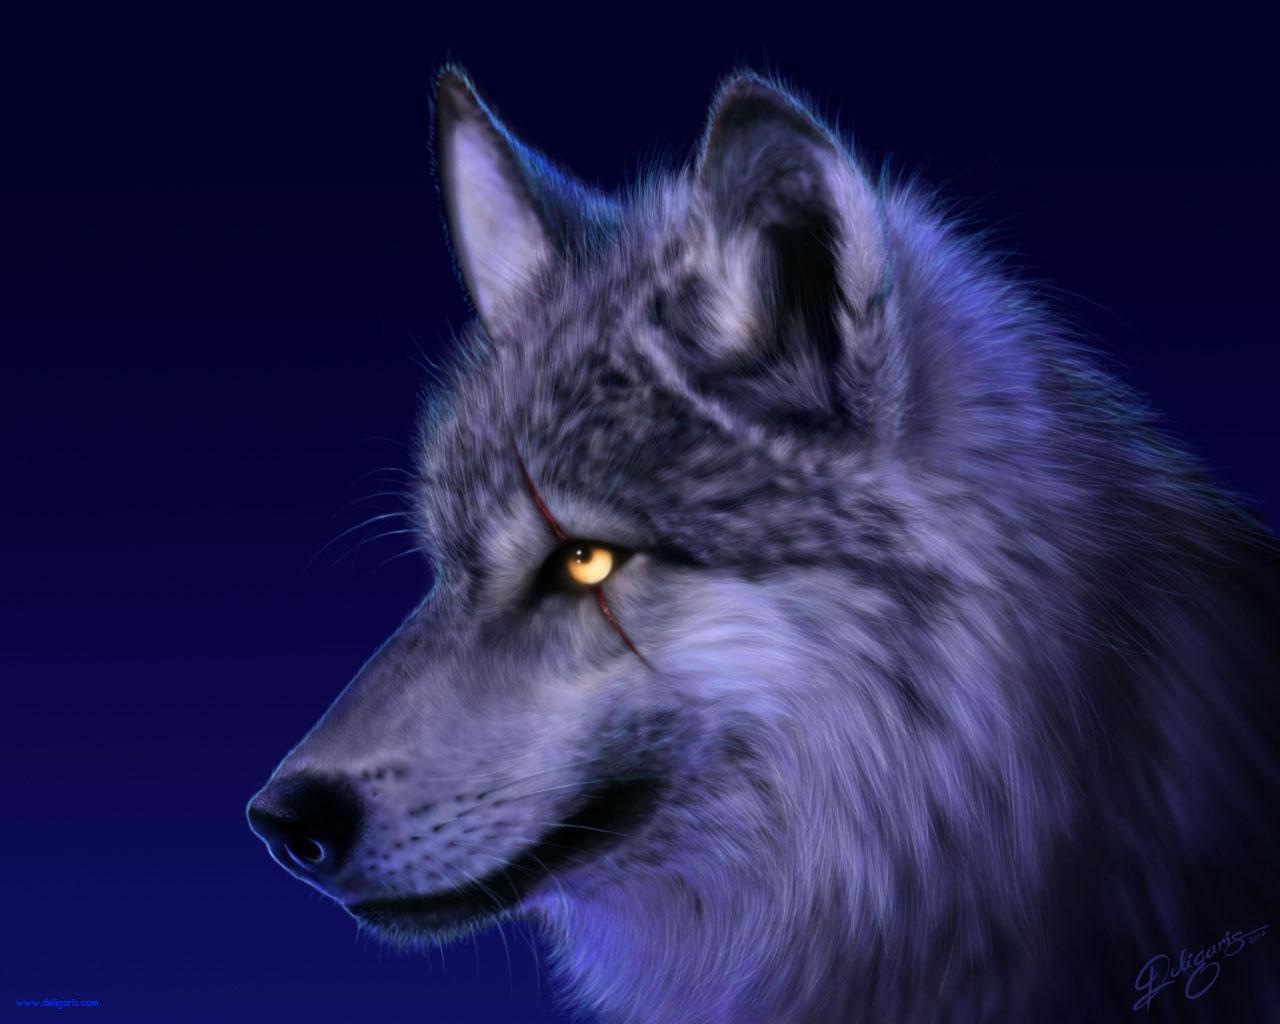 http://4.bp.blogspot.com/-KS5K5II1Z8I/TnSPu3zLYcI/AAAAAAAAALo/rzQKR6sRSfk/s1600/Wolf_wallpaper.jpg